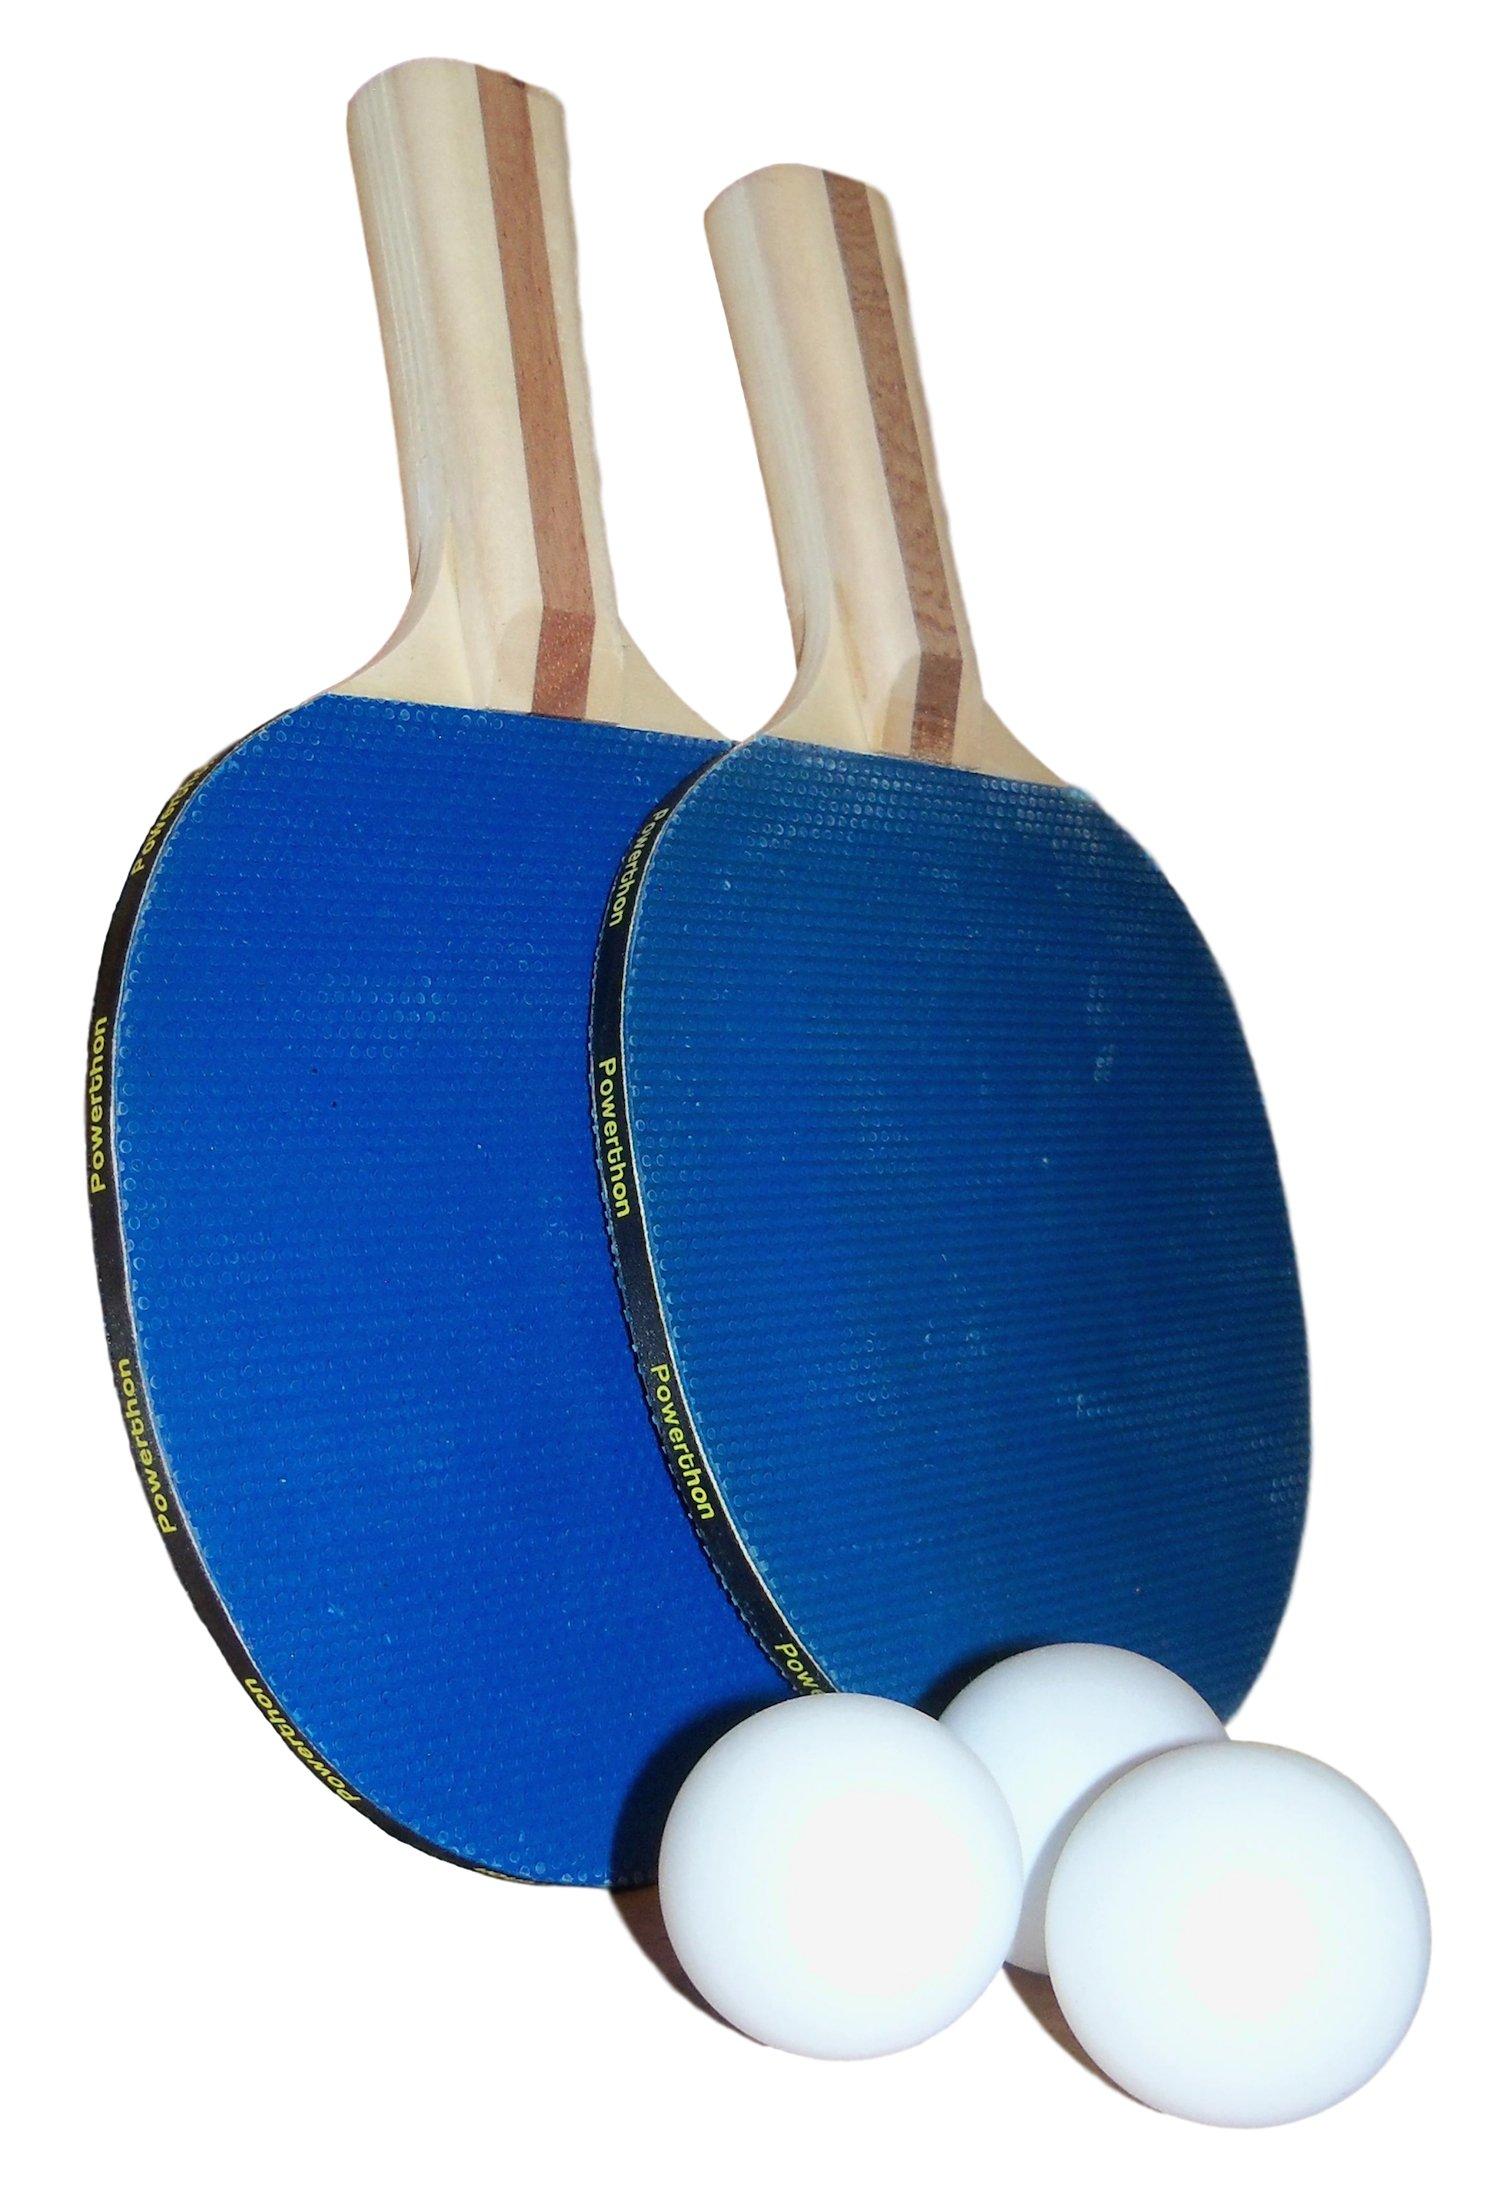 Powerthon Table Tennis Paddles - Set of 2 Recreational Table Tennis Paddles with 3 Upgraded Table Tennis Balls